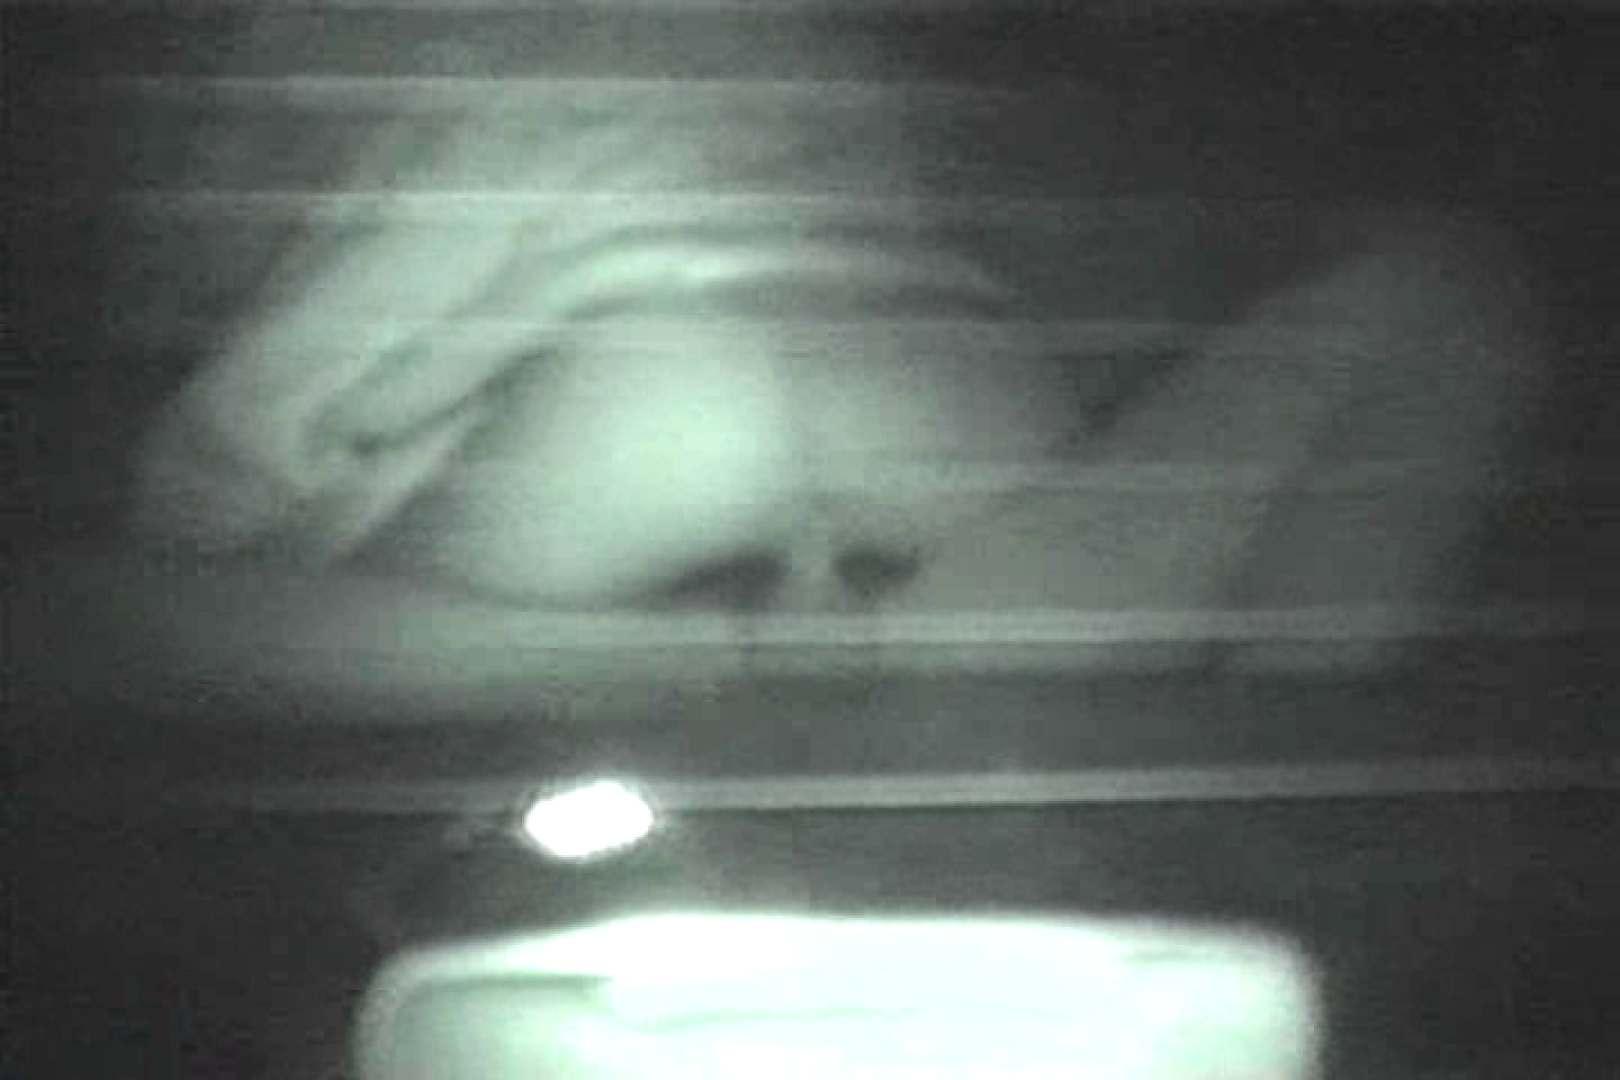 MASAさんの待ち伏せ撮り! 赤外線カーセックスVol.6 赤外線 オマンコ無修正動画無料 20pic 15